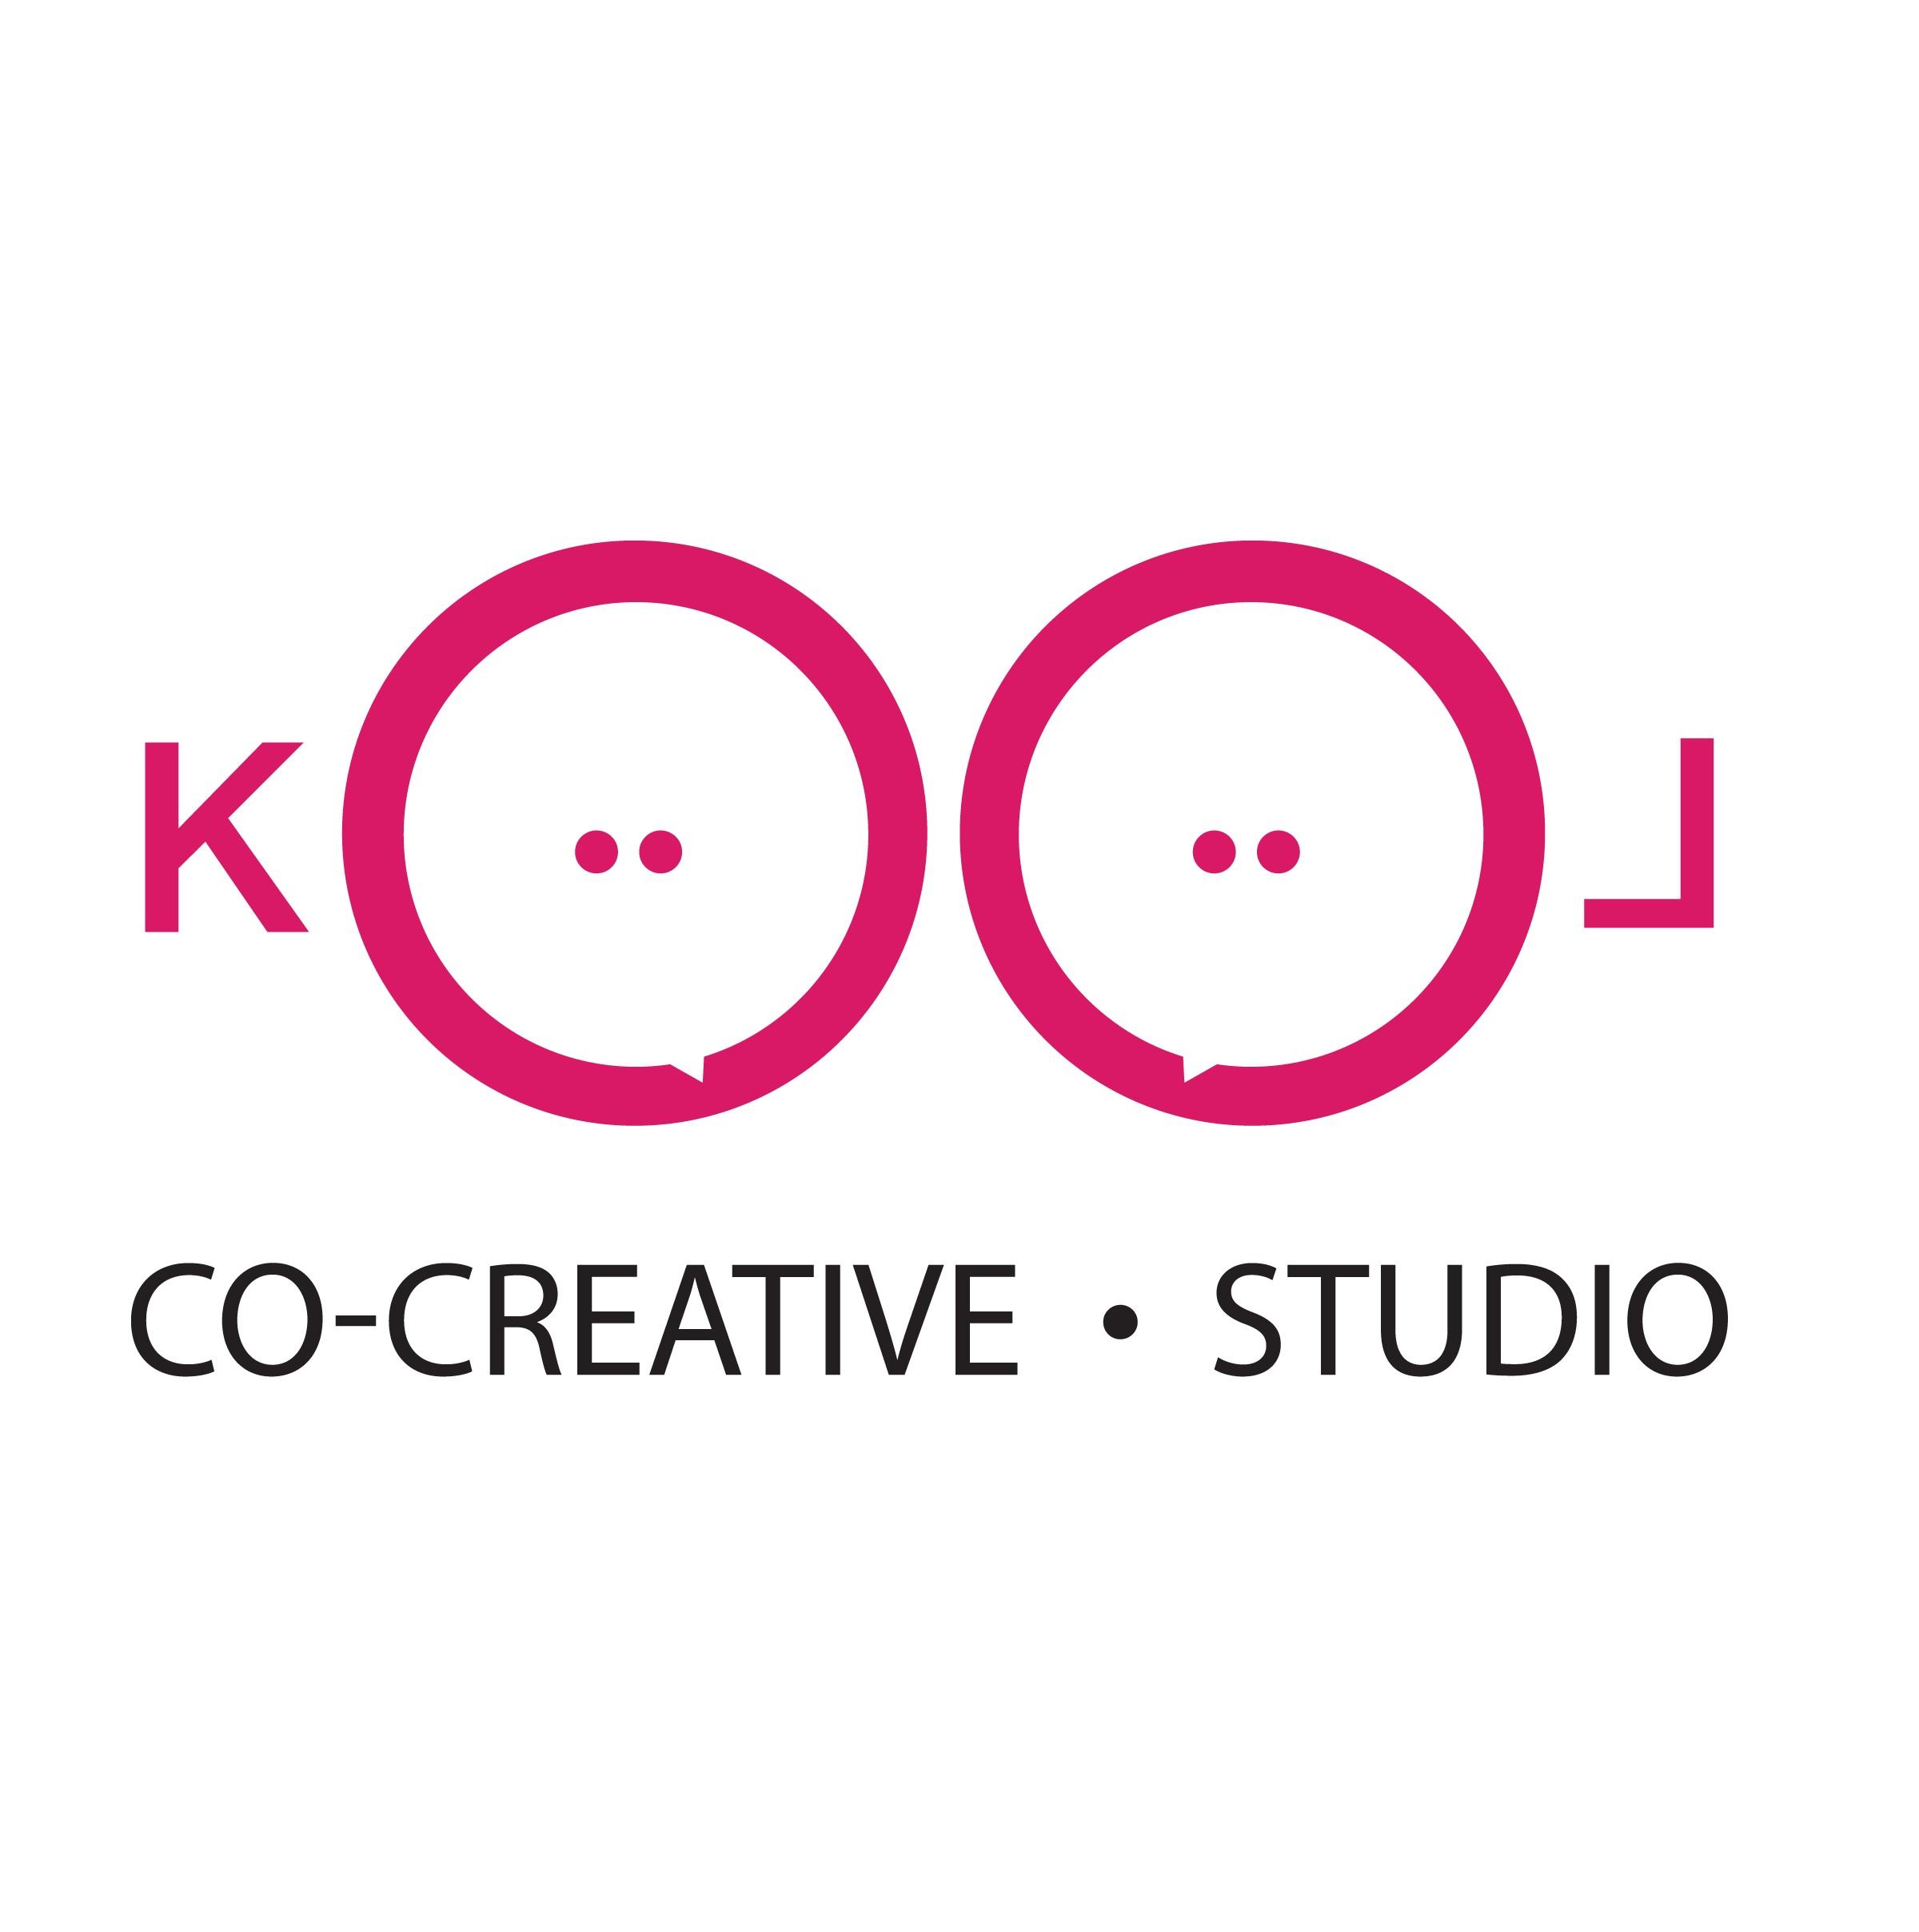 logo - co-creative + studio new-low.jpg